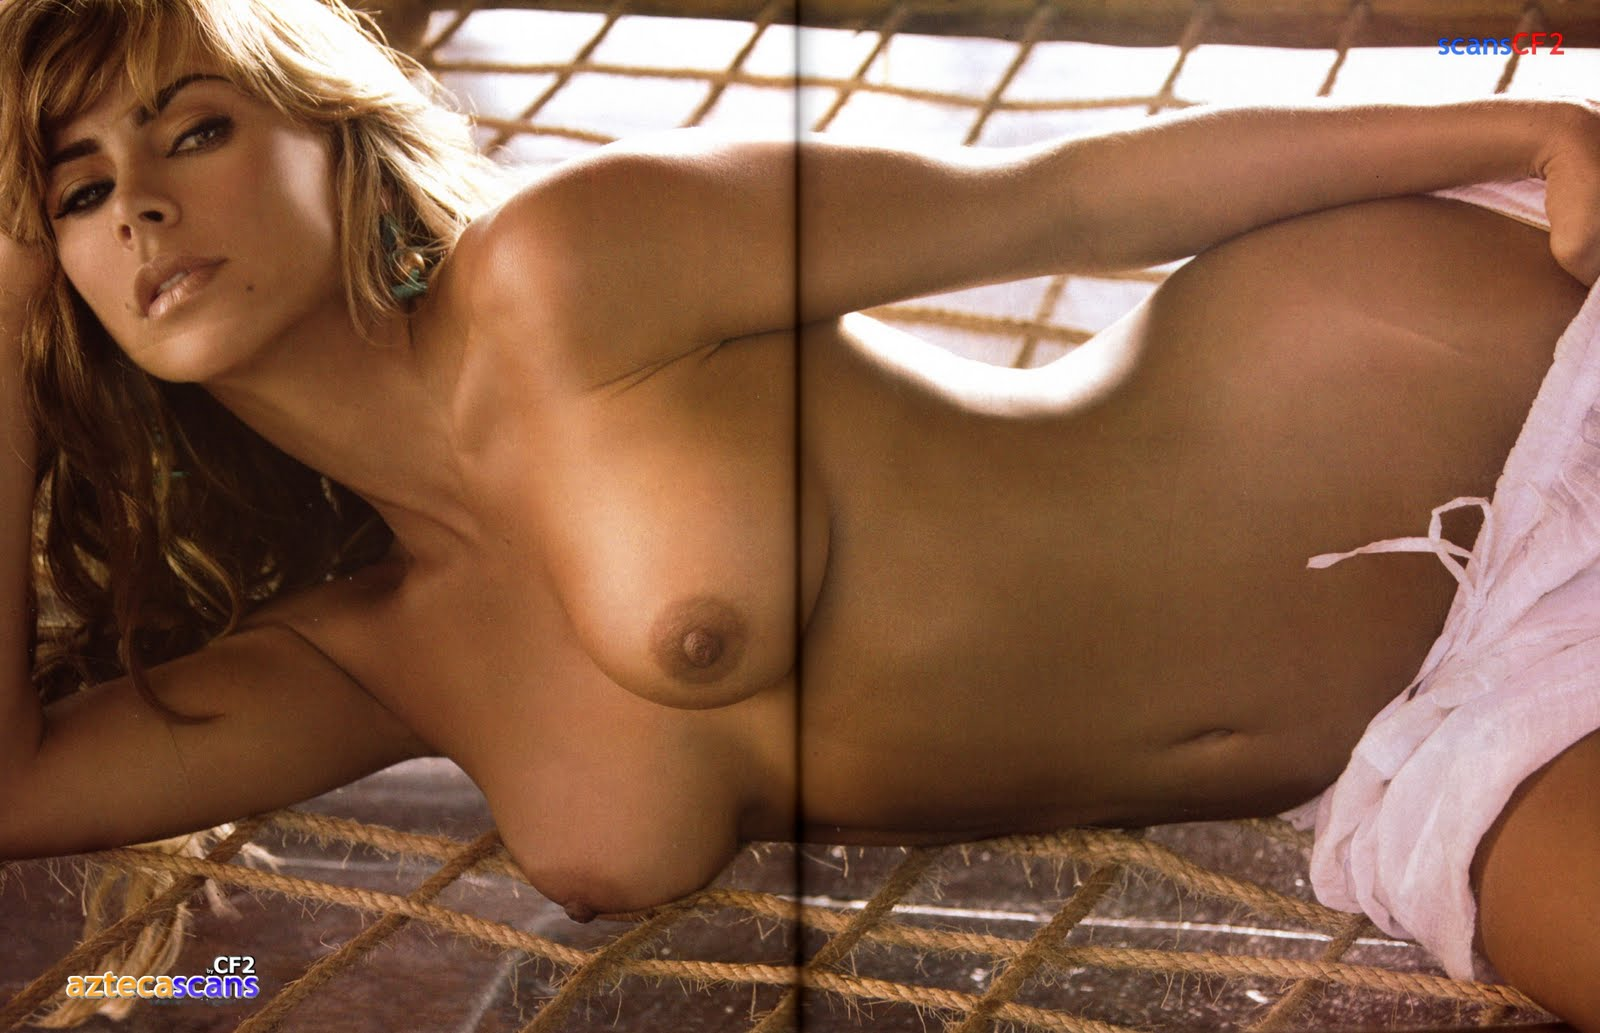 http://3.bp.blogspot.com/_Qs_vRRWNMOU/S98epwE2ruI/AAAAAAAABdE/XaYM9CfrrEI/s1600/AYLIN+EXTREMO+ENERO+(11).jpg